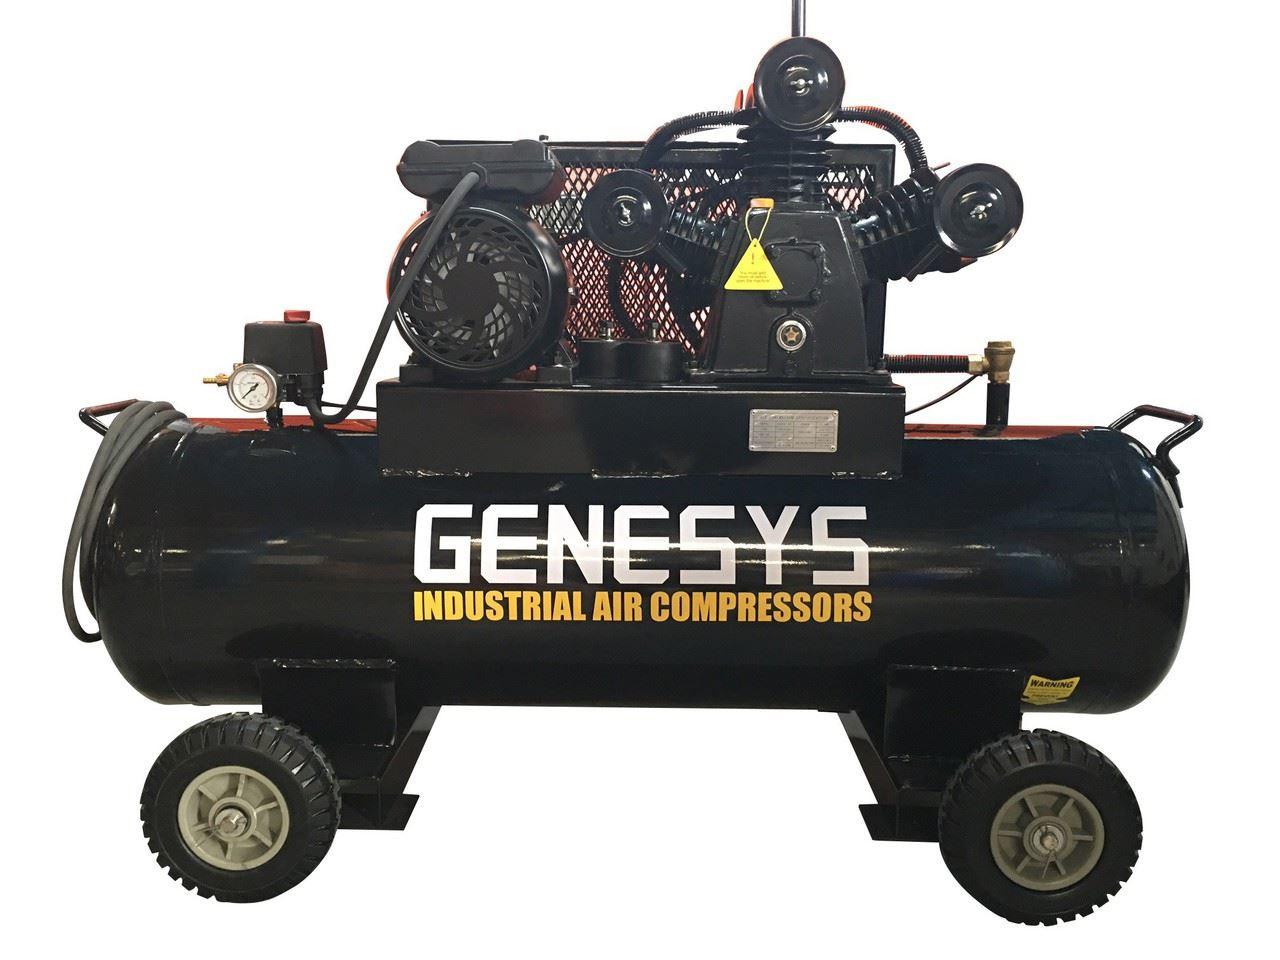 Piston Air Compressor- Electric 4HP 18 CFM 120L 125 PSI